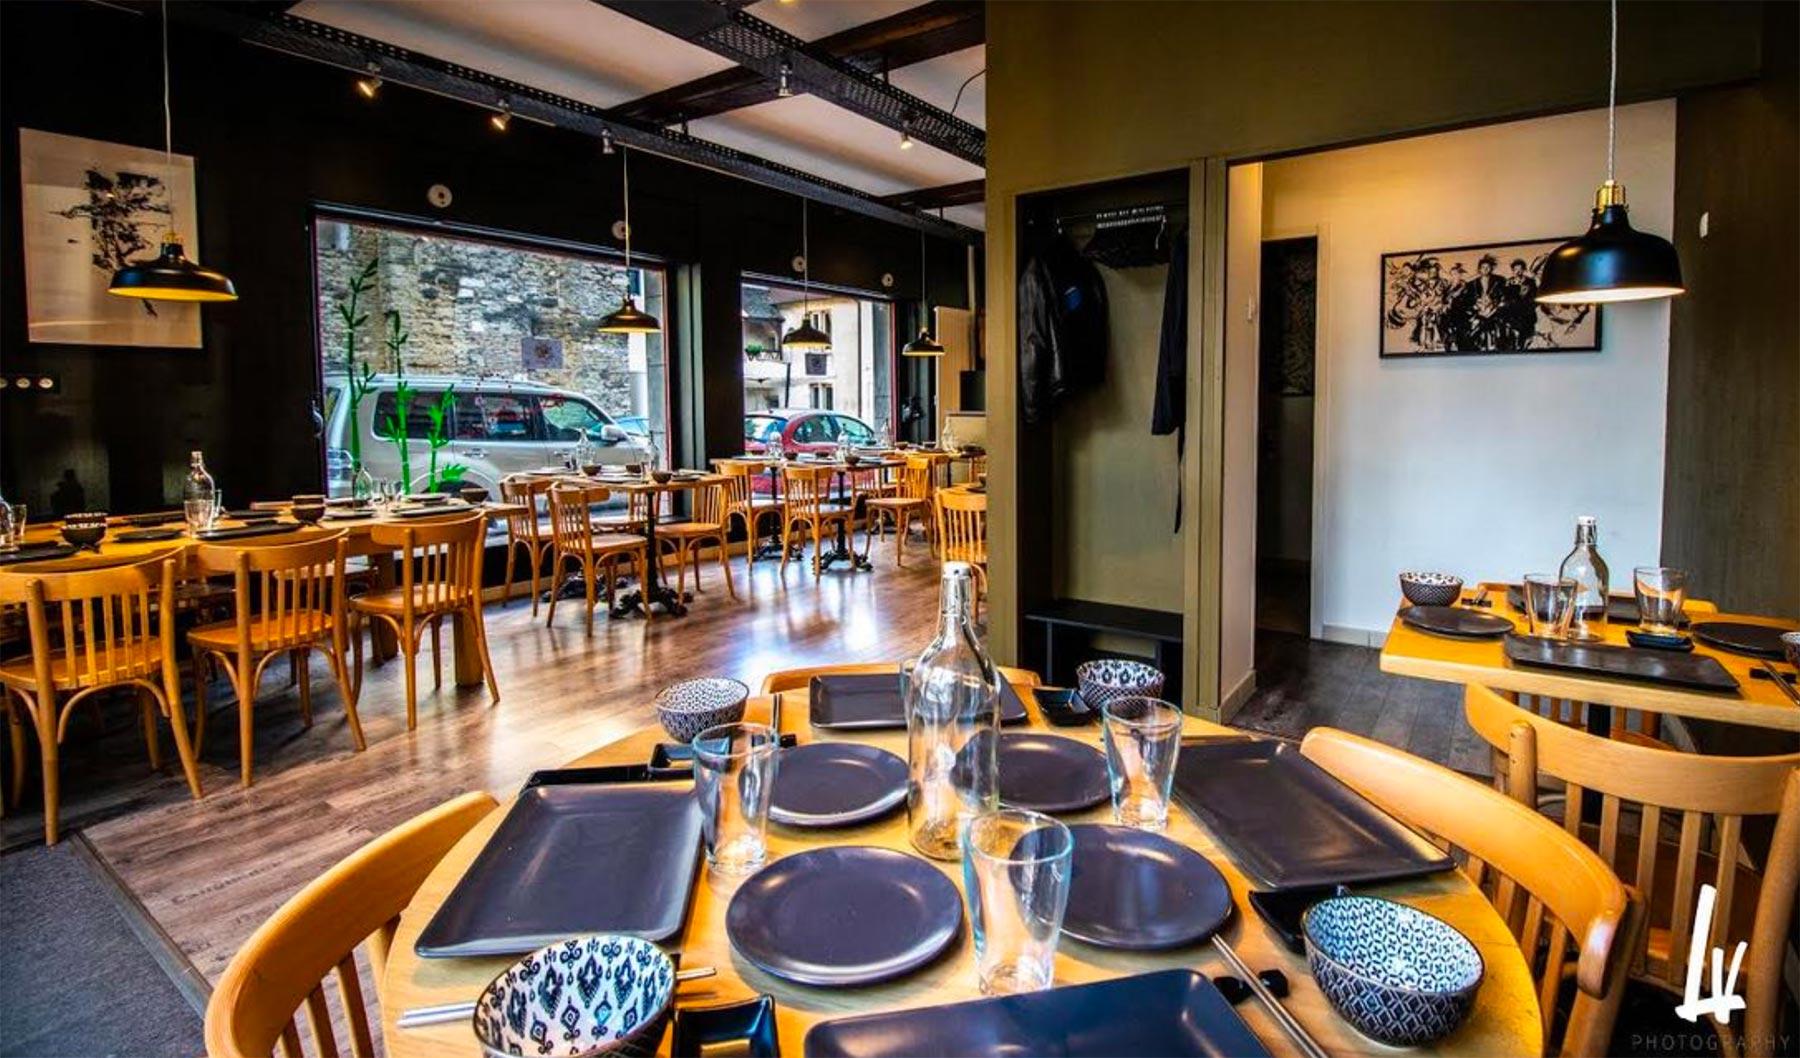 samourai-sushis-restaurant